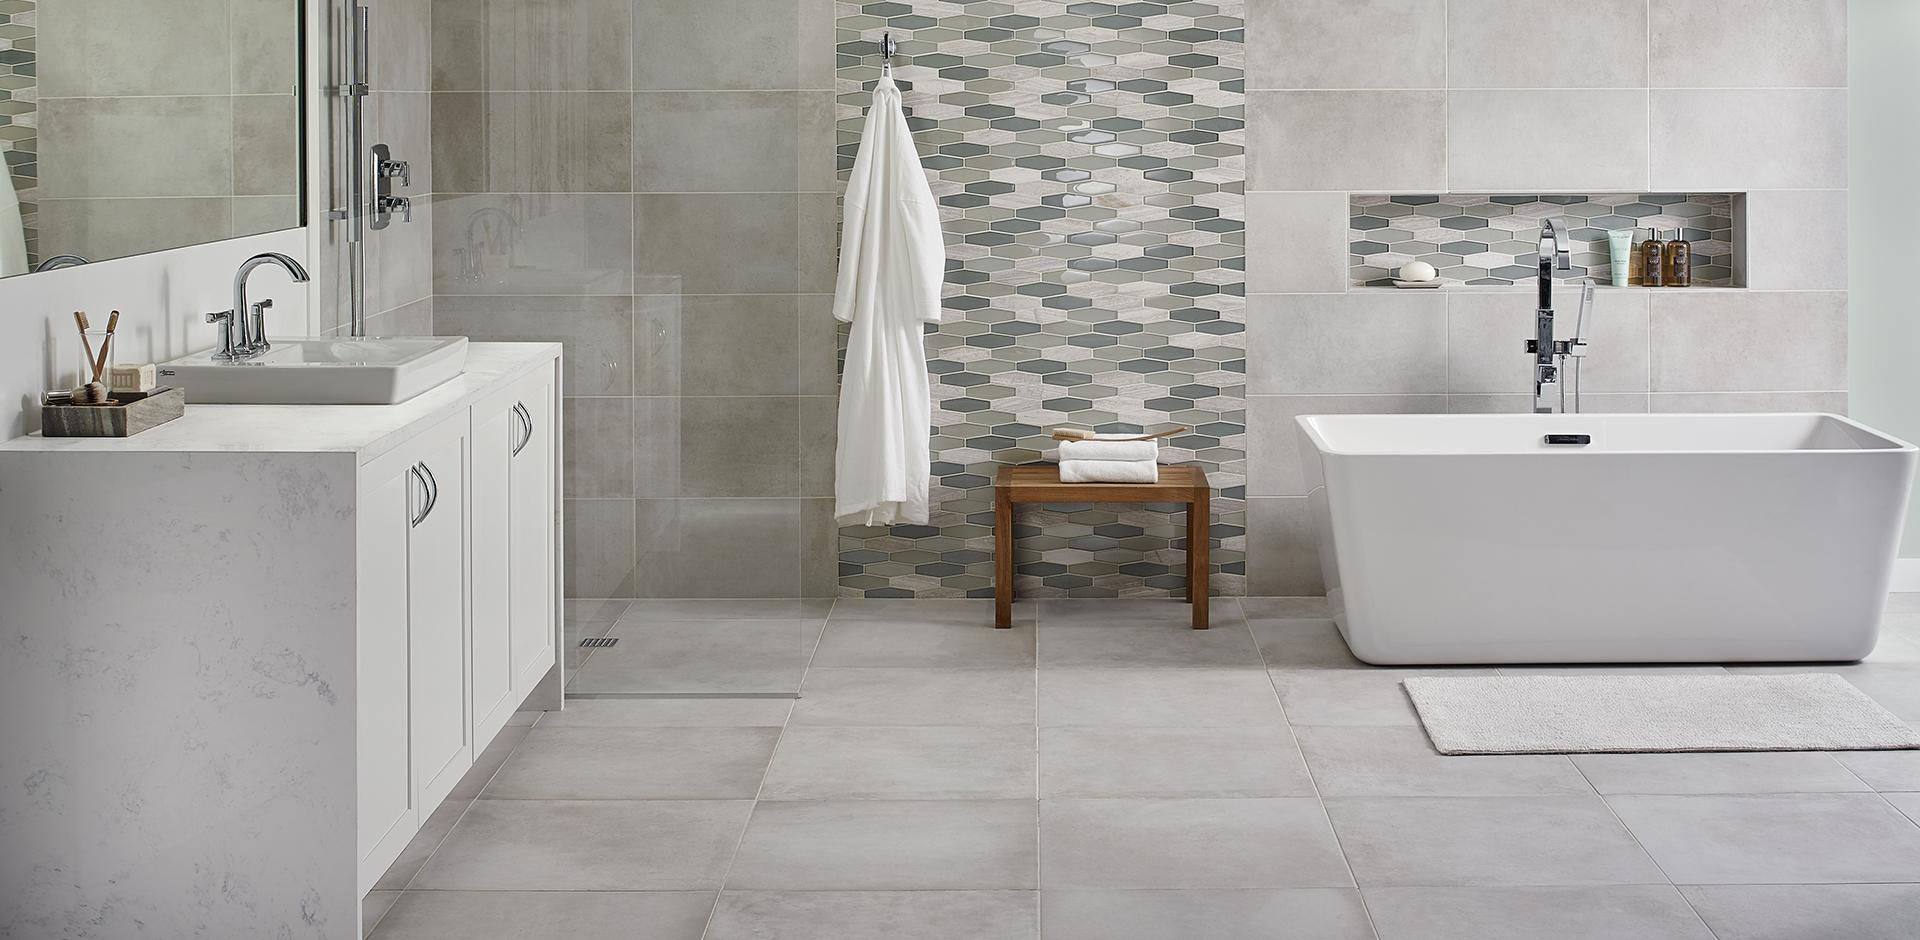 Bathroom Countertop Quartz Calacatta Vicenza